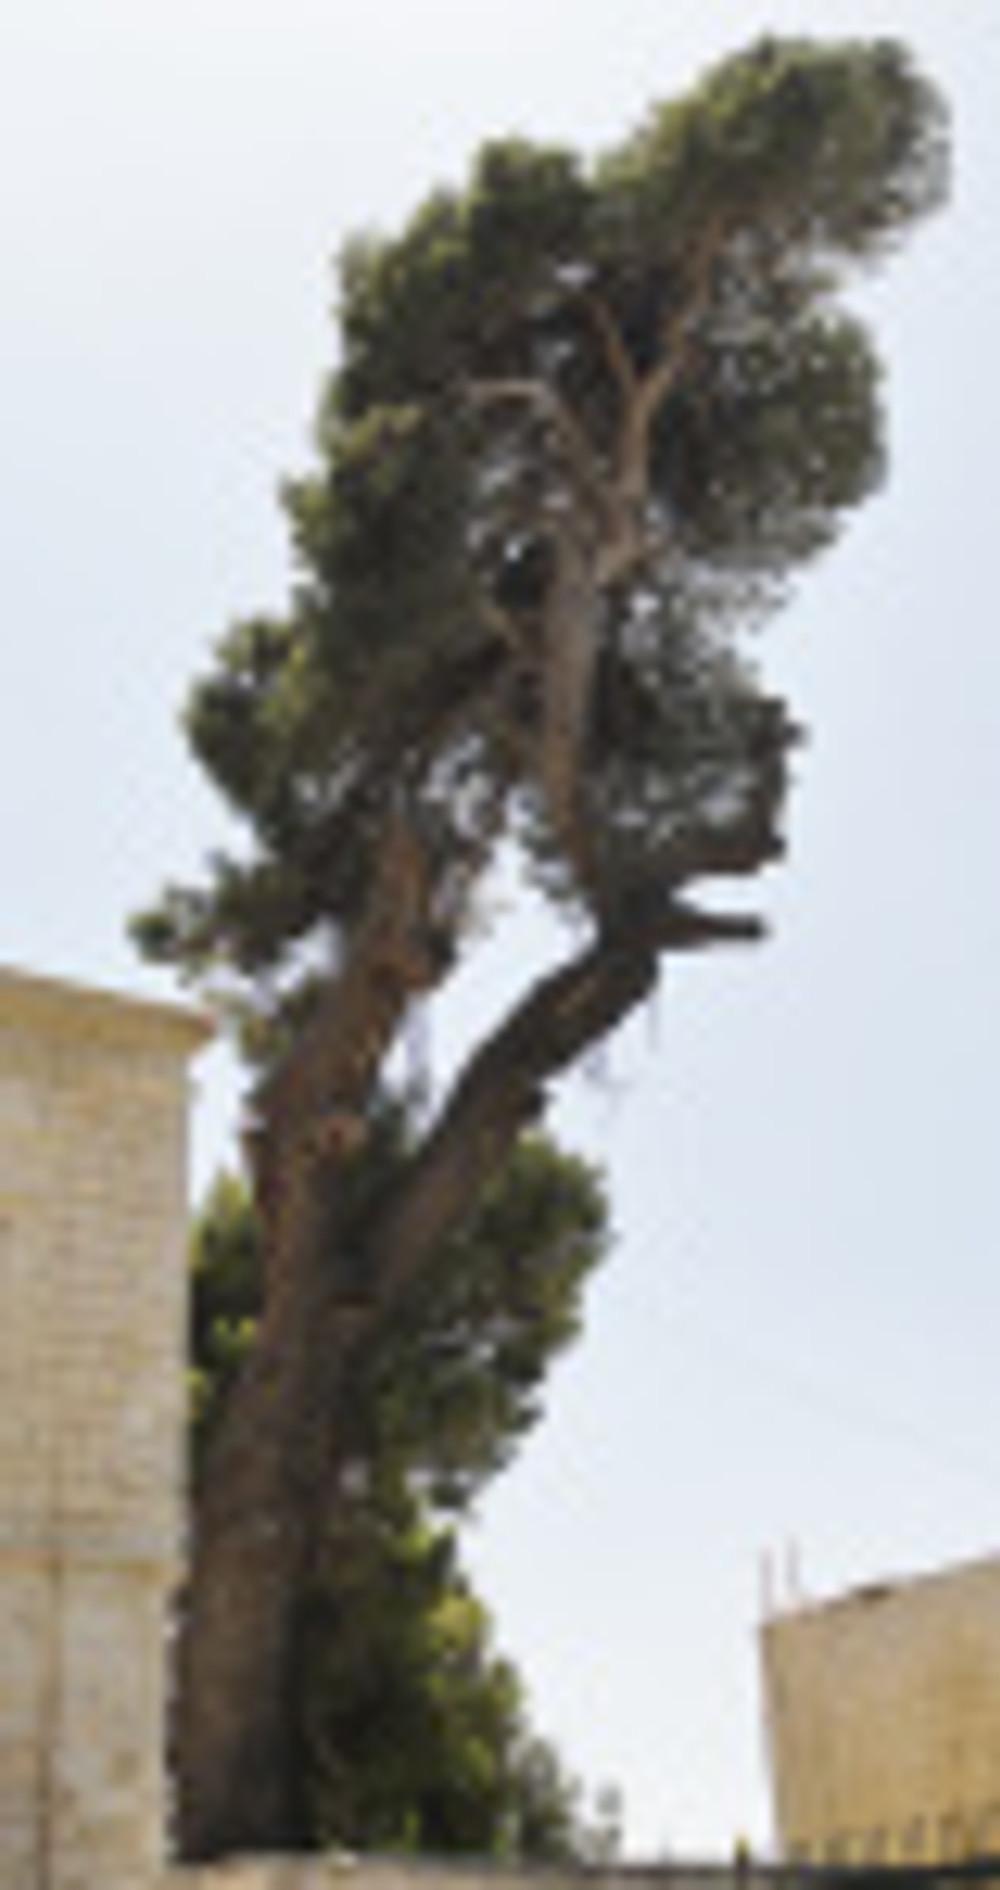 Pinus halepensis, Aleppo pine